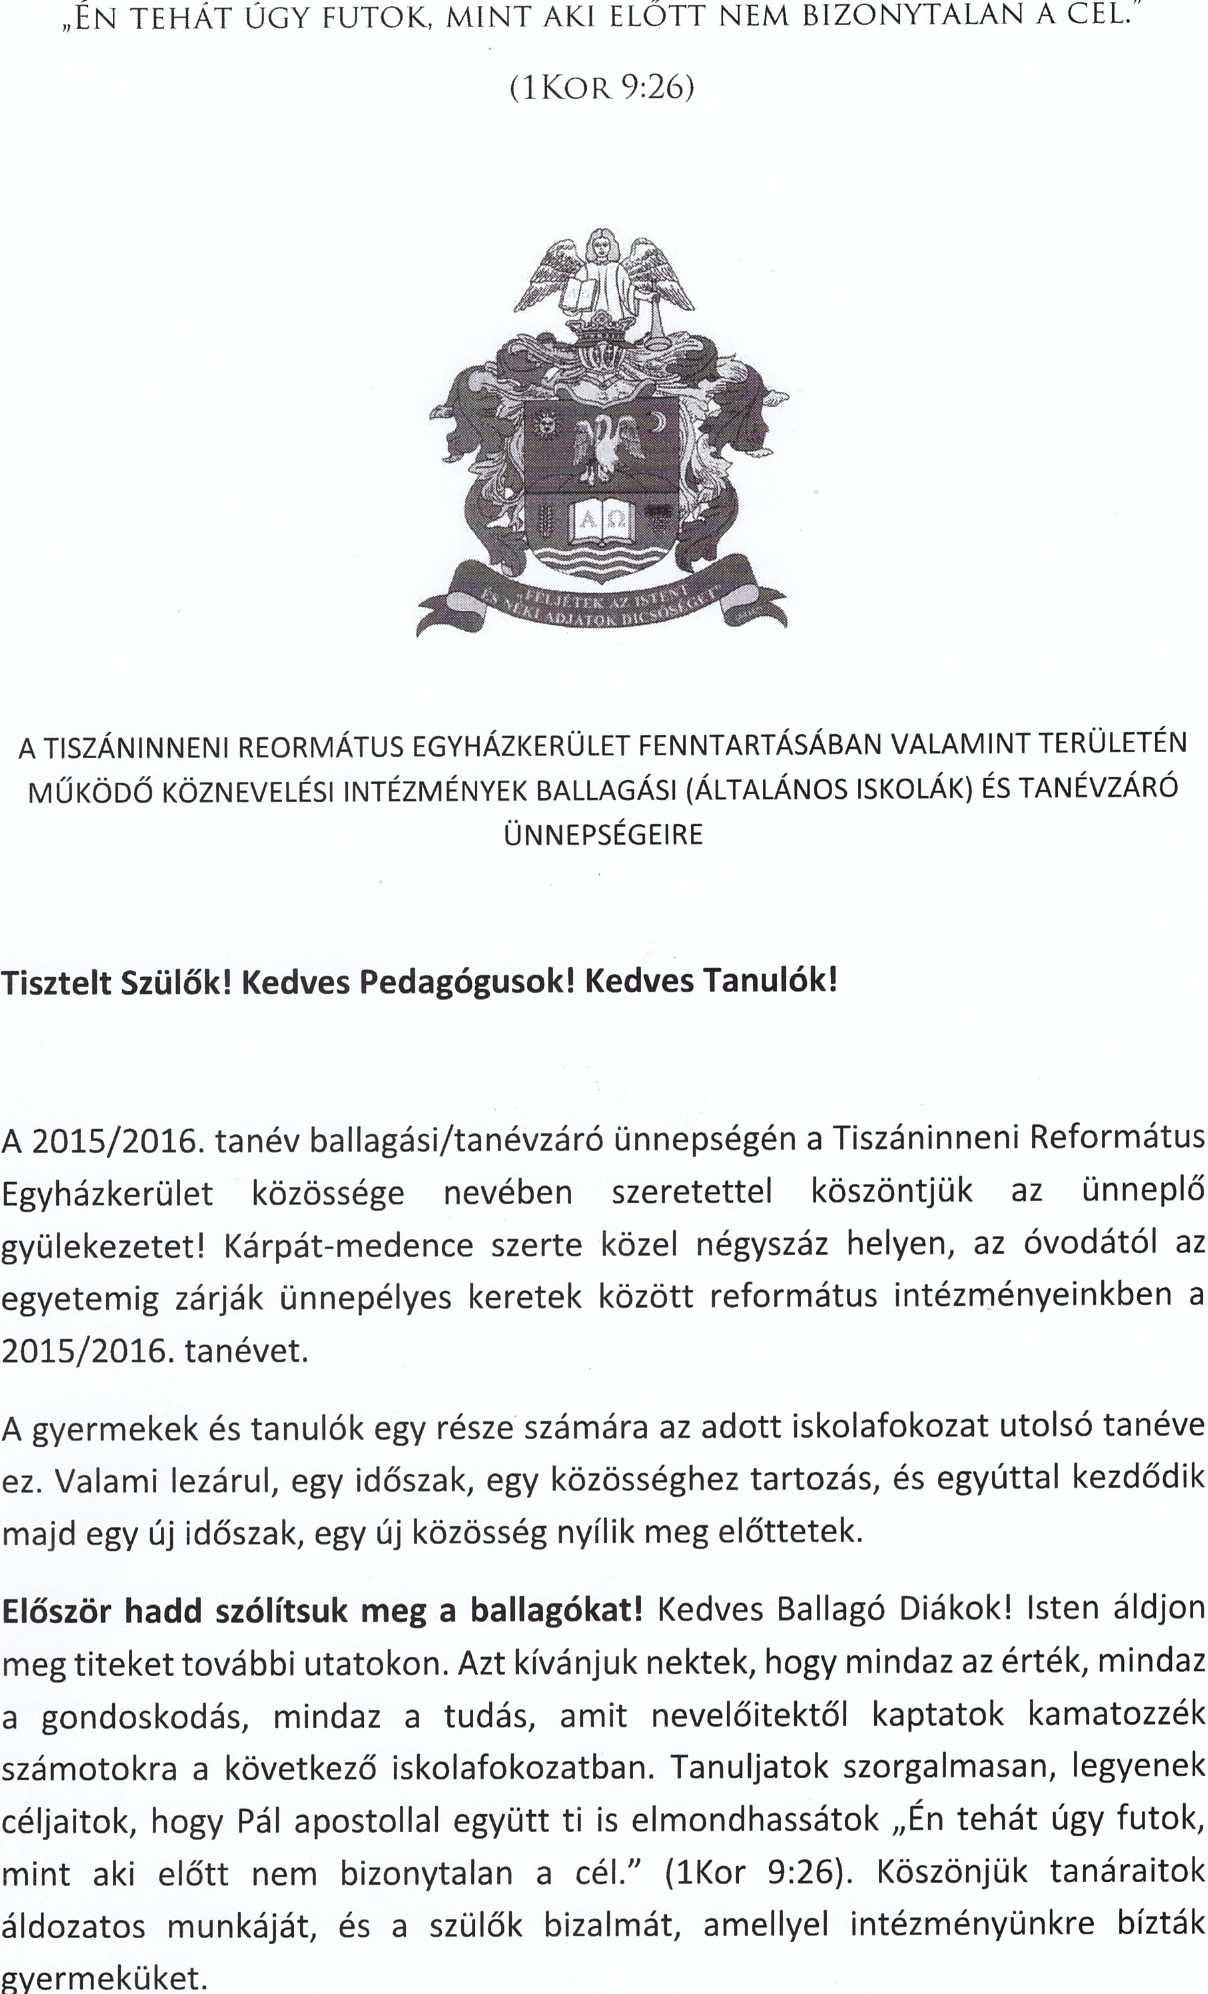 Selyemréti Iskola: pednapik1 - indafoto.hu